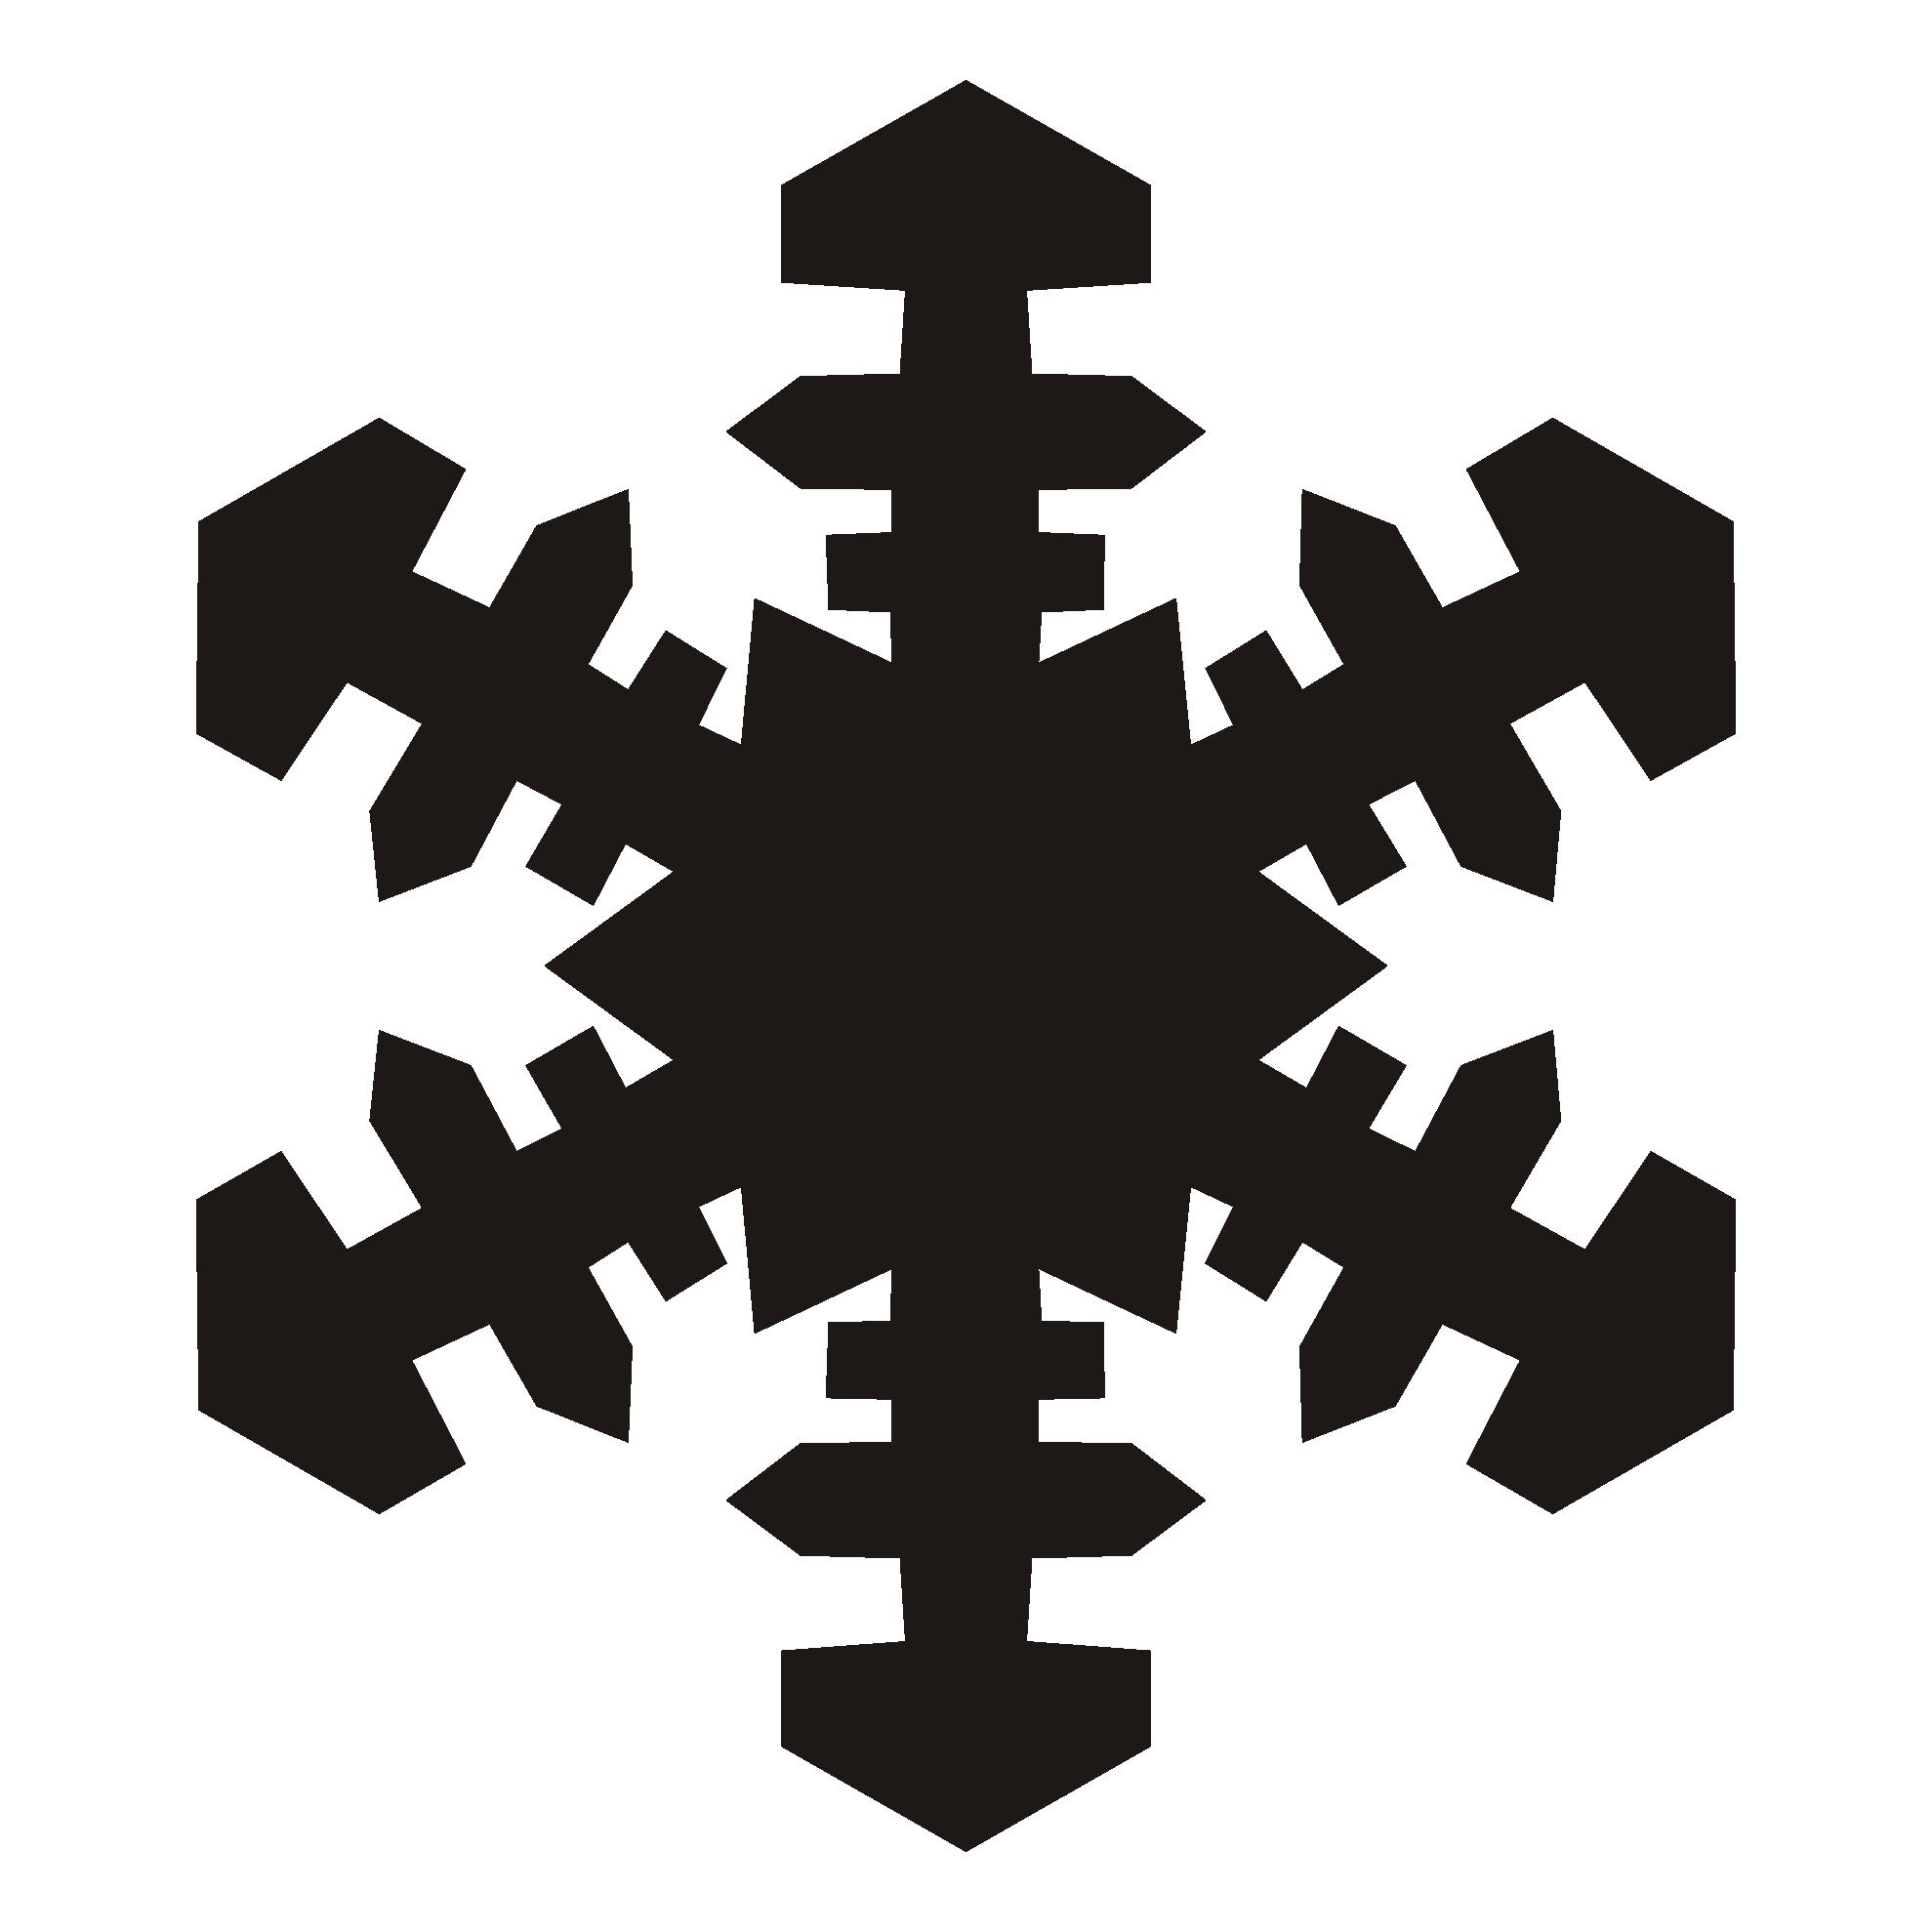 1979x1979 Snowflake Clipart Silhouette